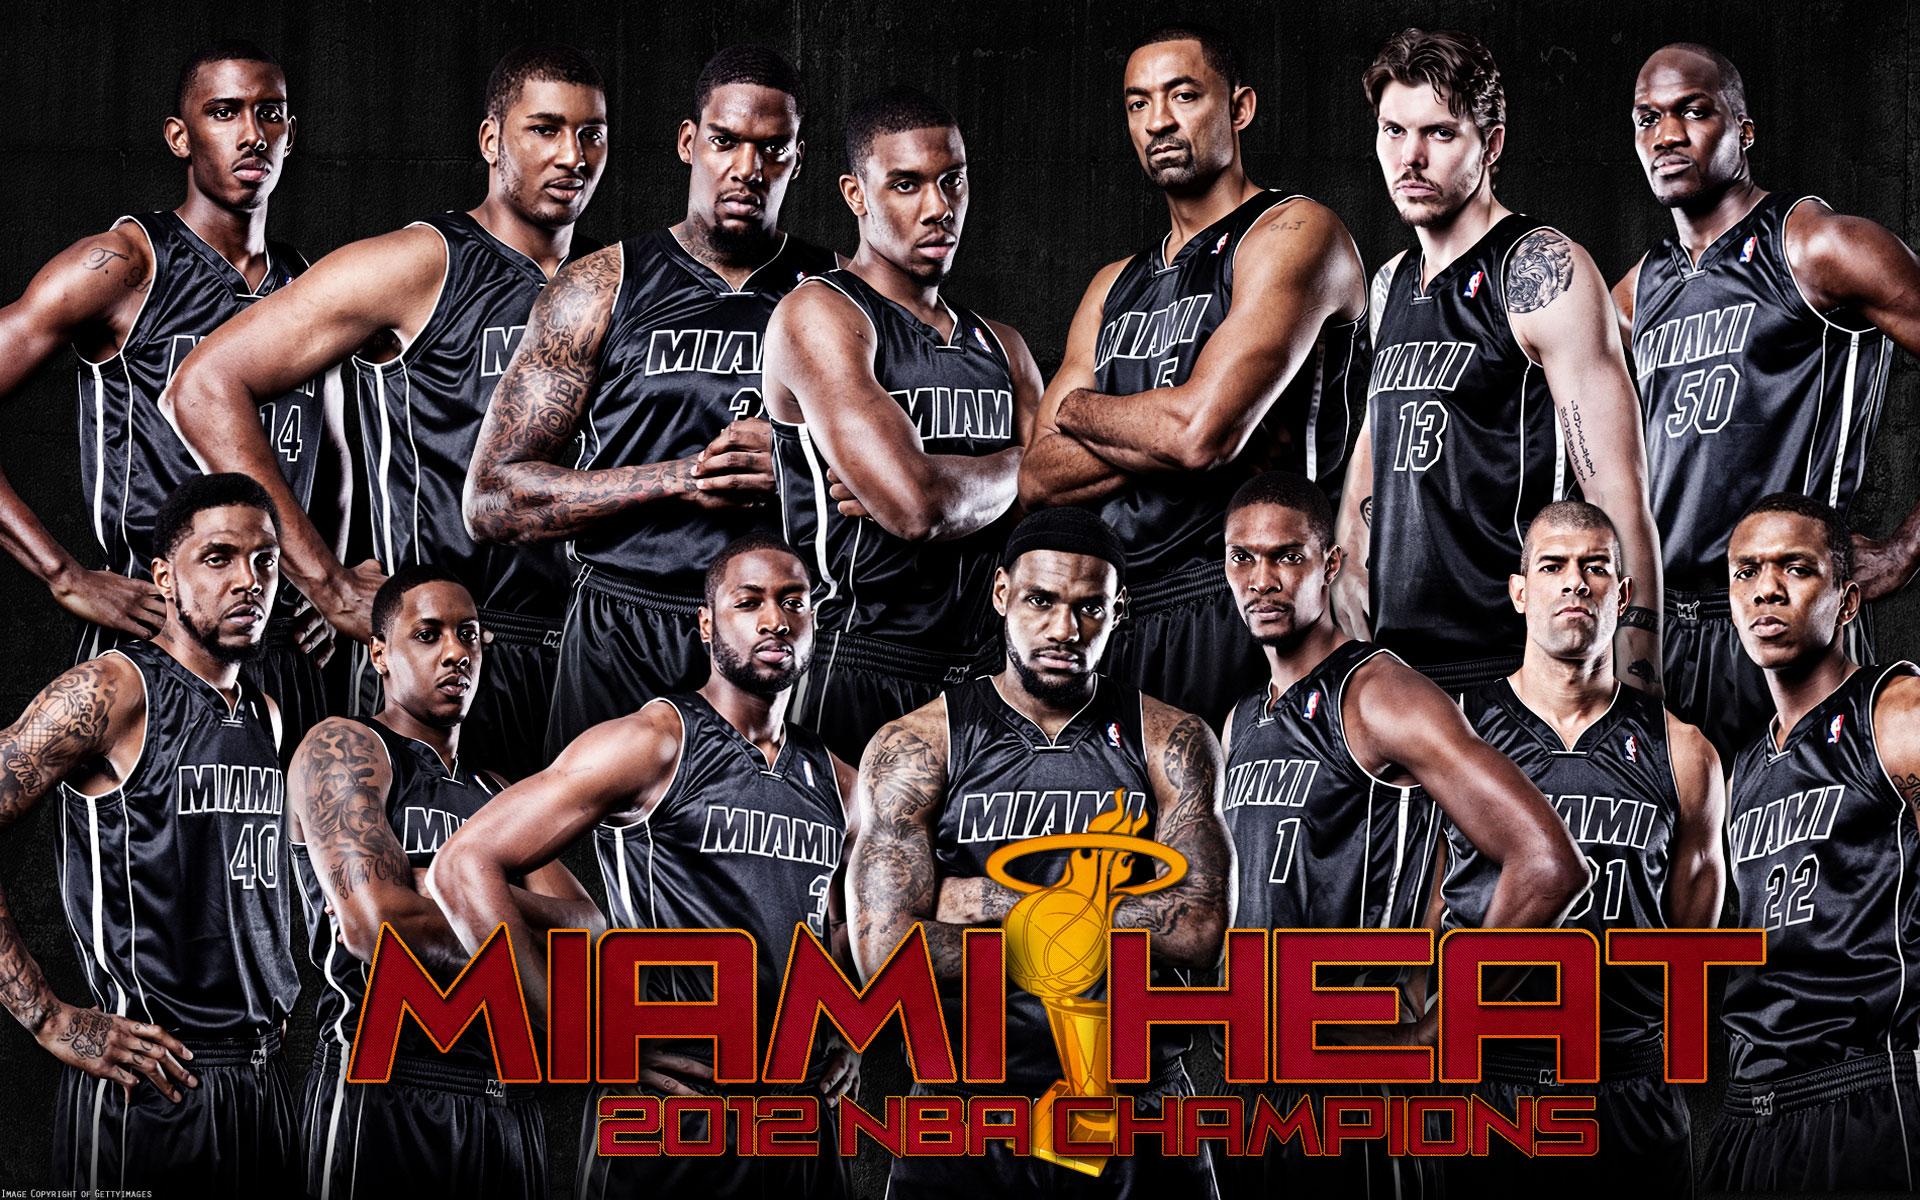 Miami Heat Team 2013 Wallpaper for Desktop 1920x1200